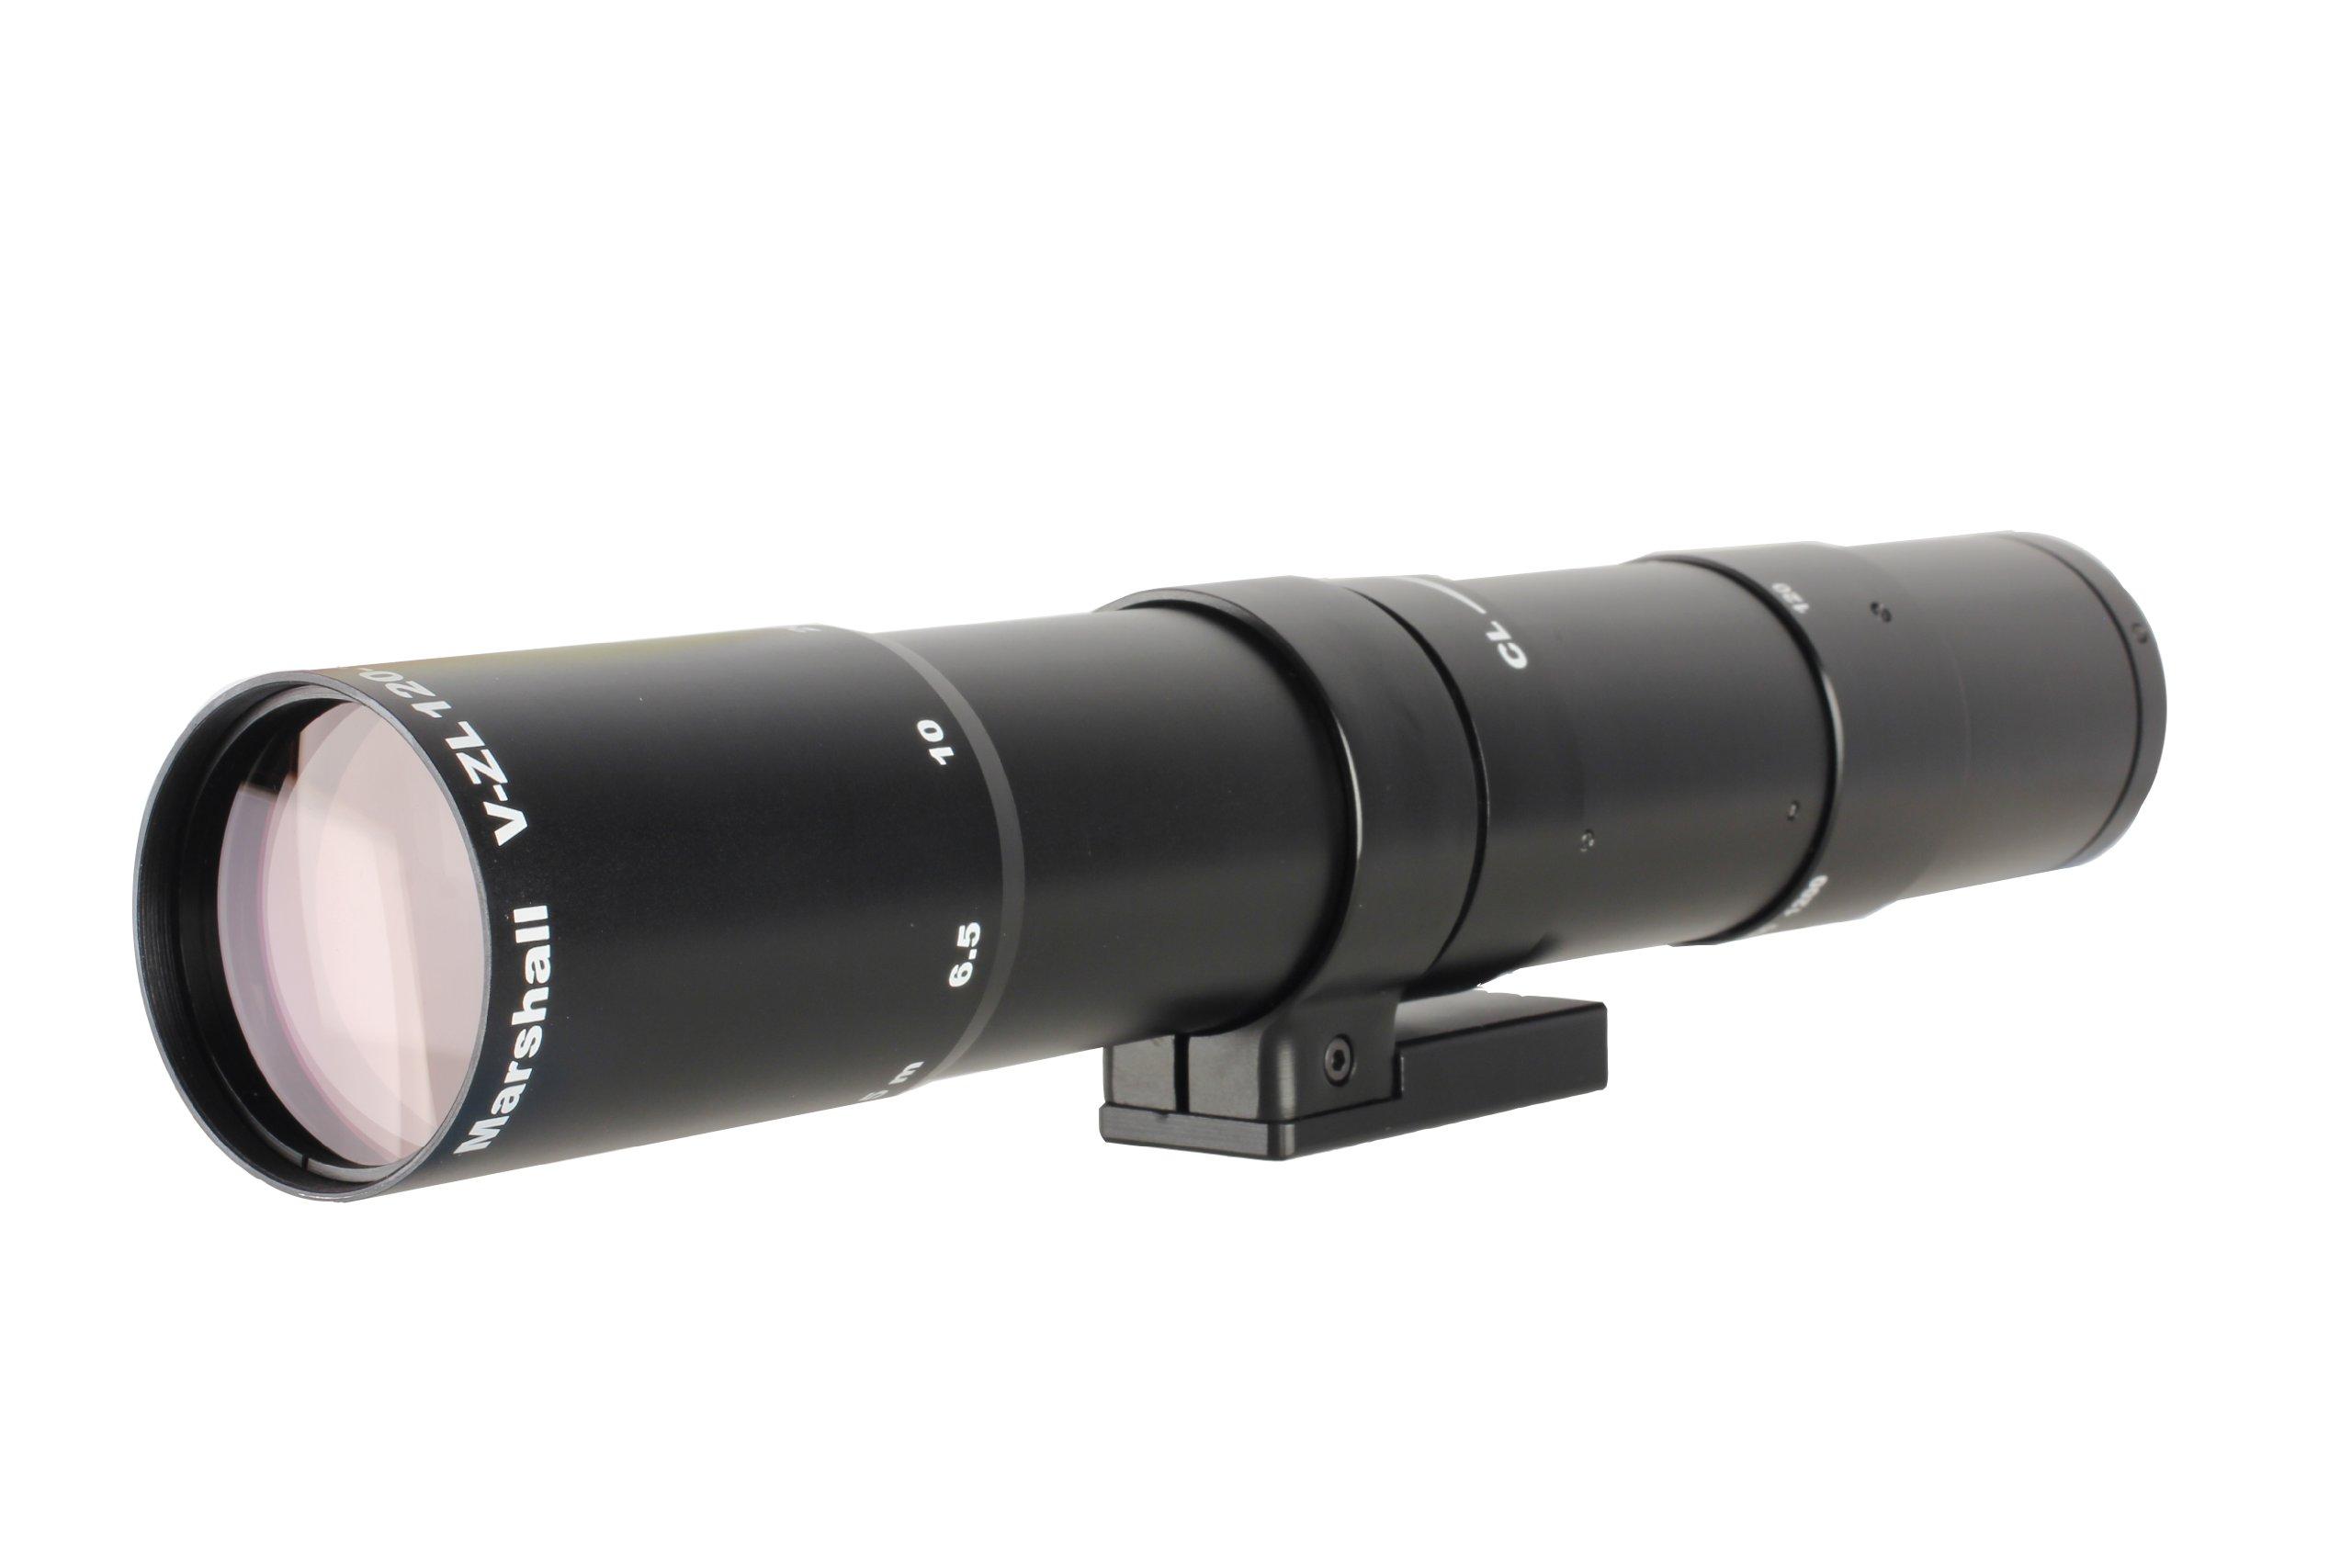 Marshall Electronics V-ZL120-1200 120mm to 1200mm Hi-Tech Zoom Lens (Black)